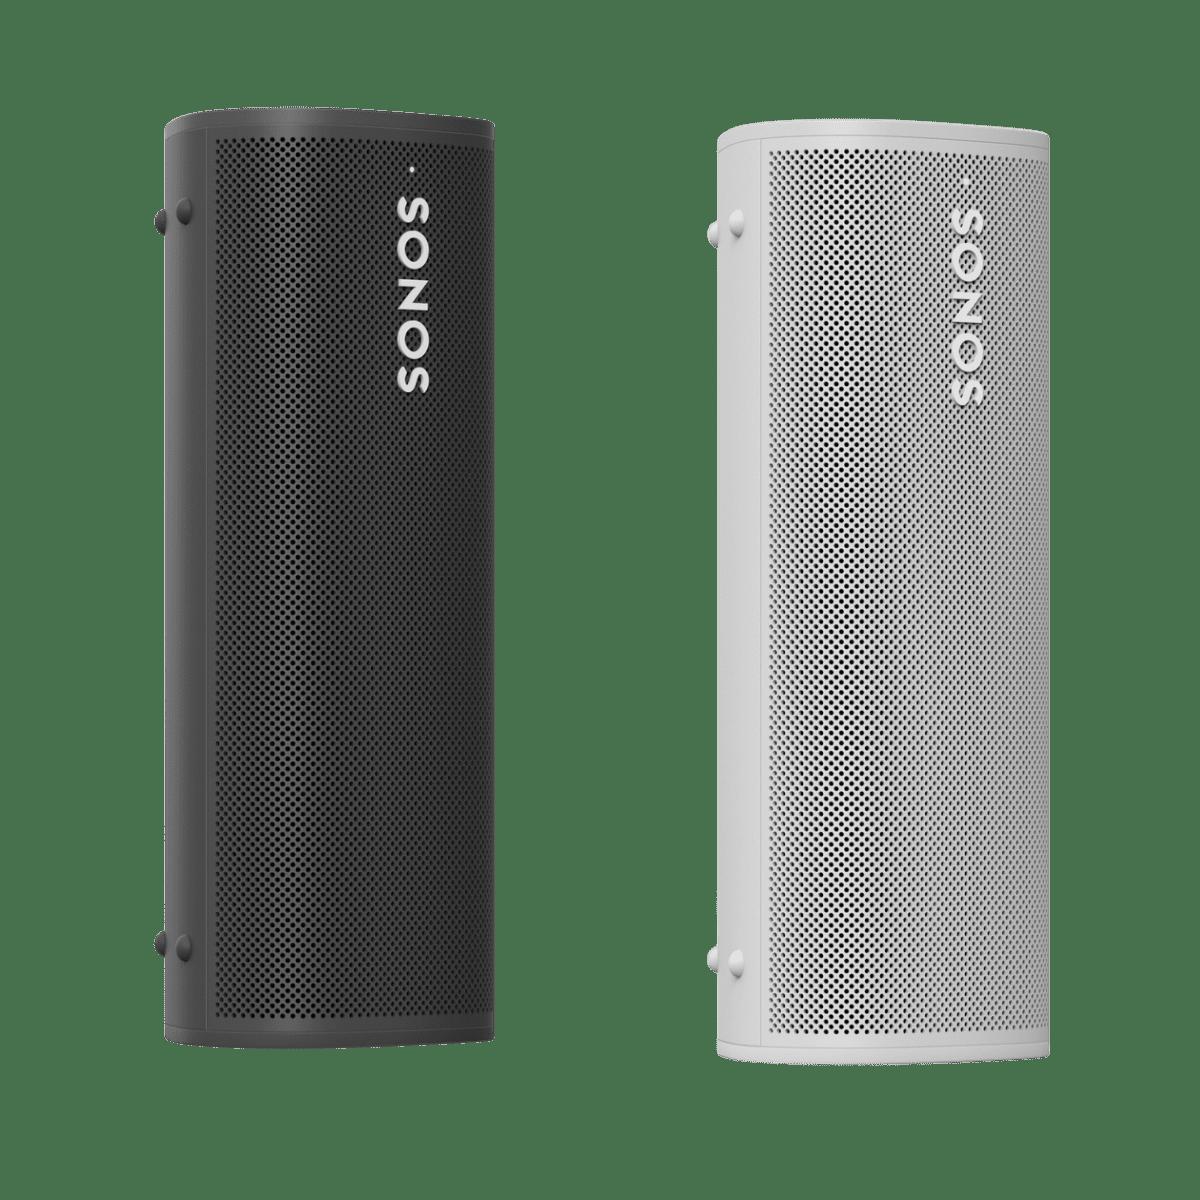 Roam - Sonos - 1200x1200